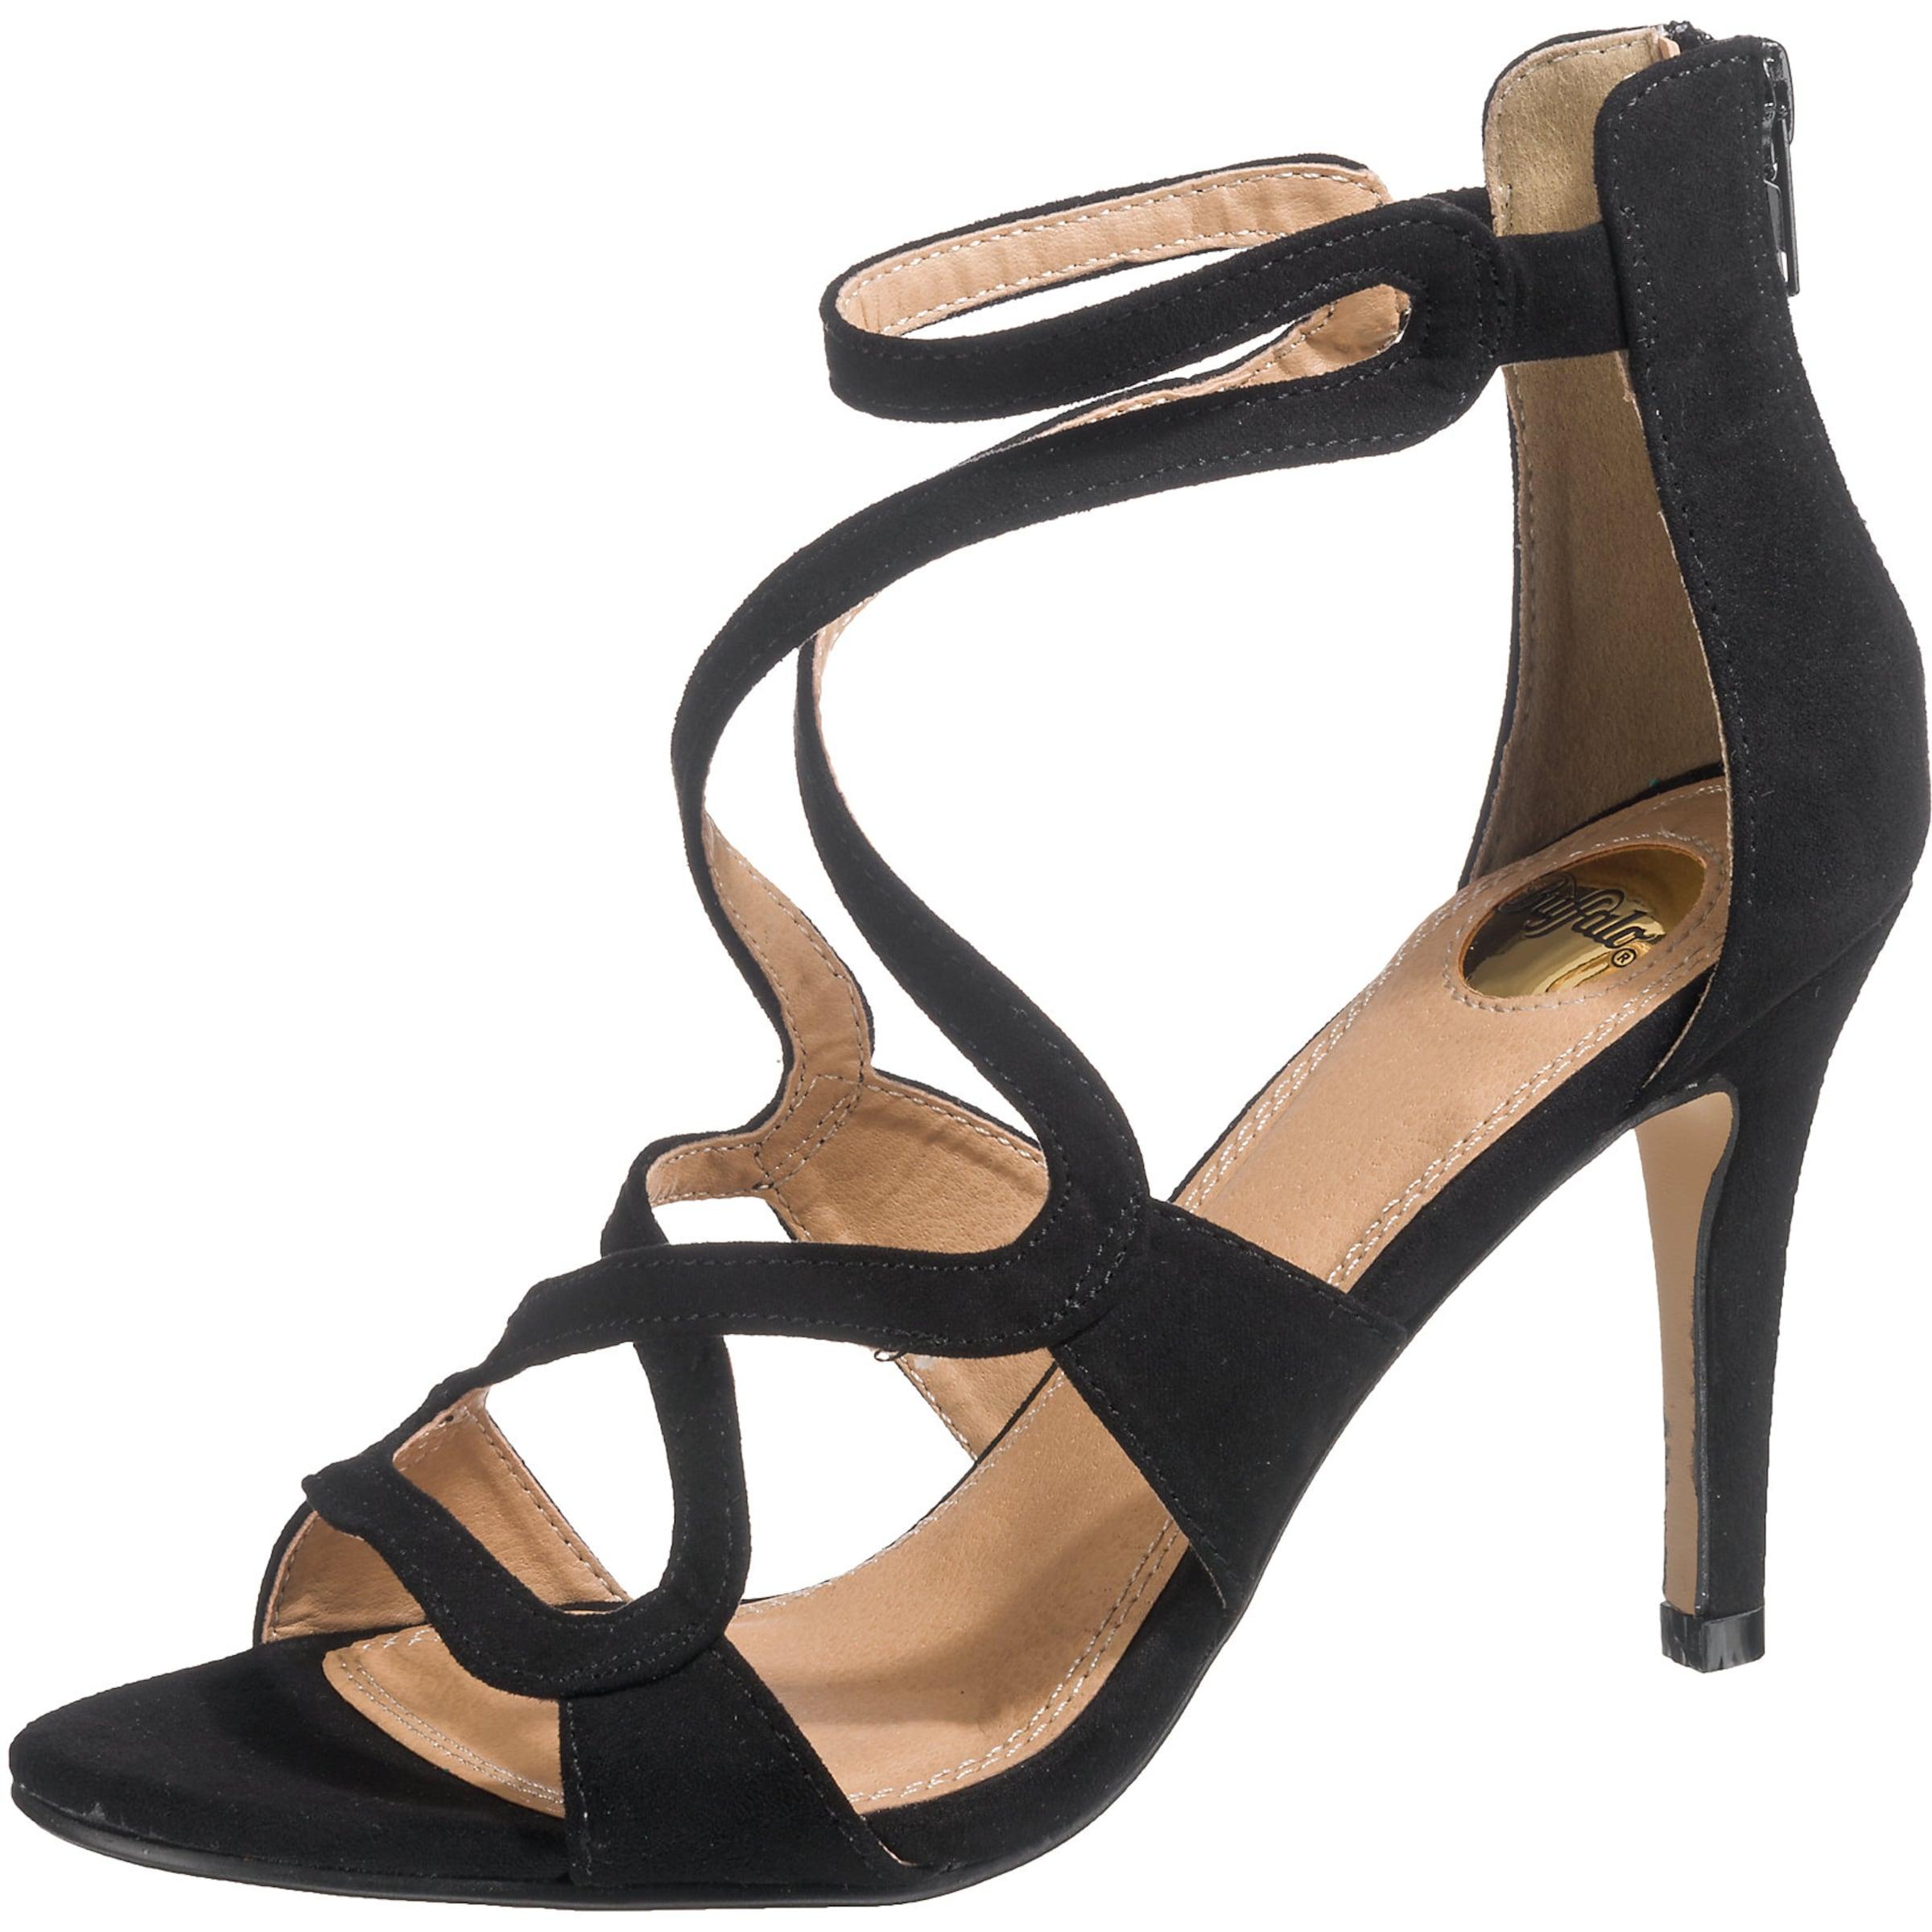 BUFFALO Riemchensandaletten Verschleißfeste billige Schuhe Hohe Qualität